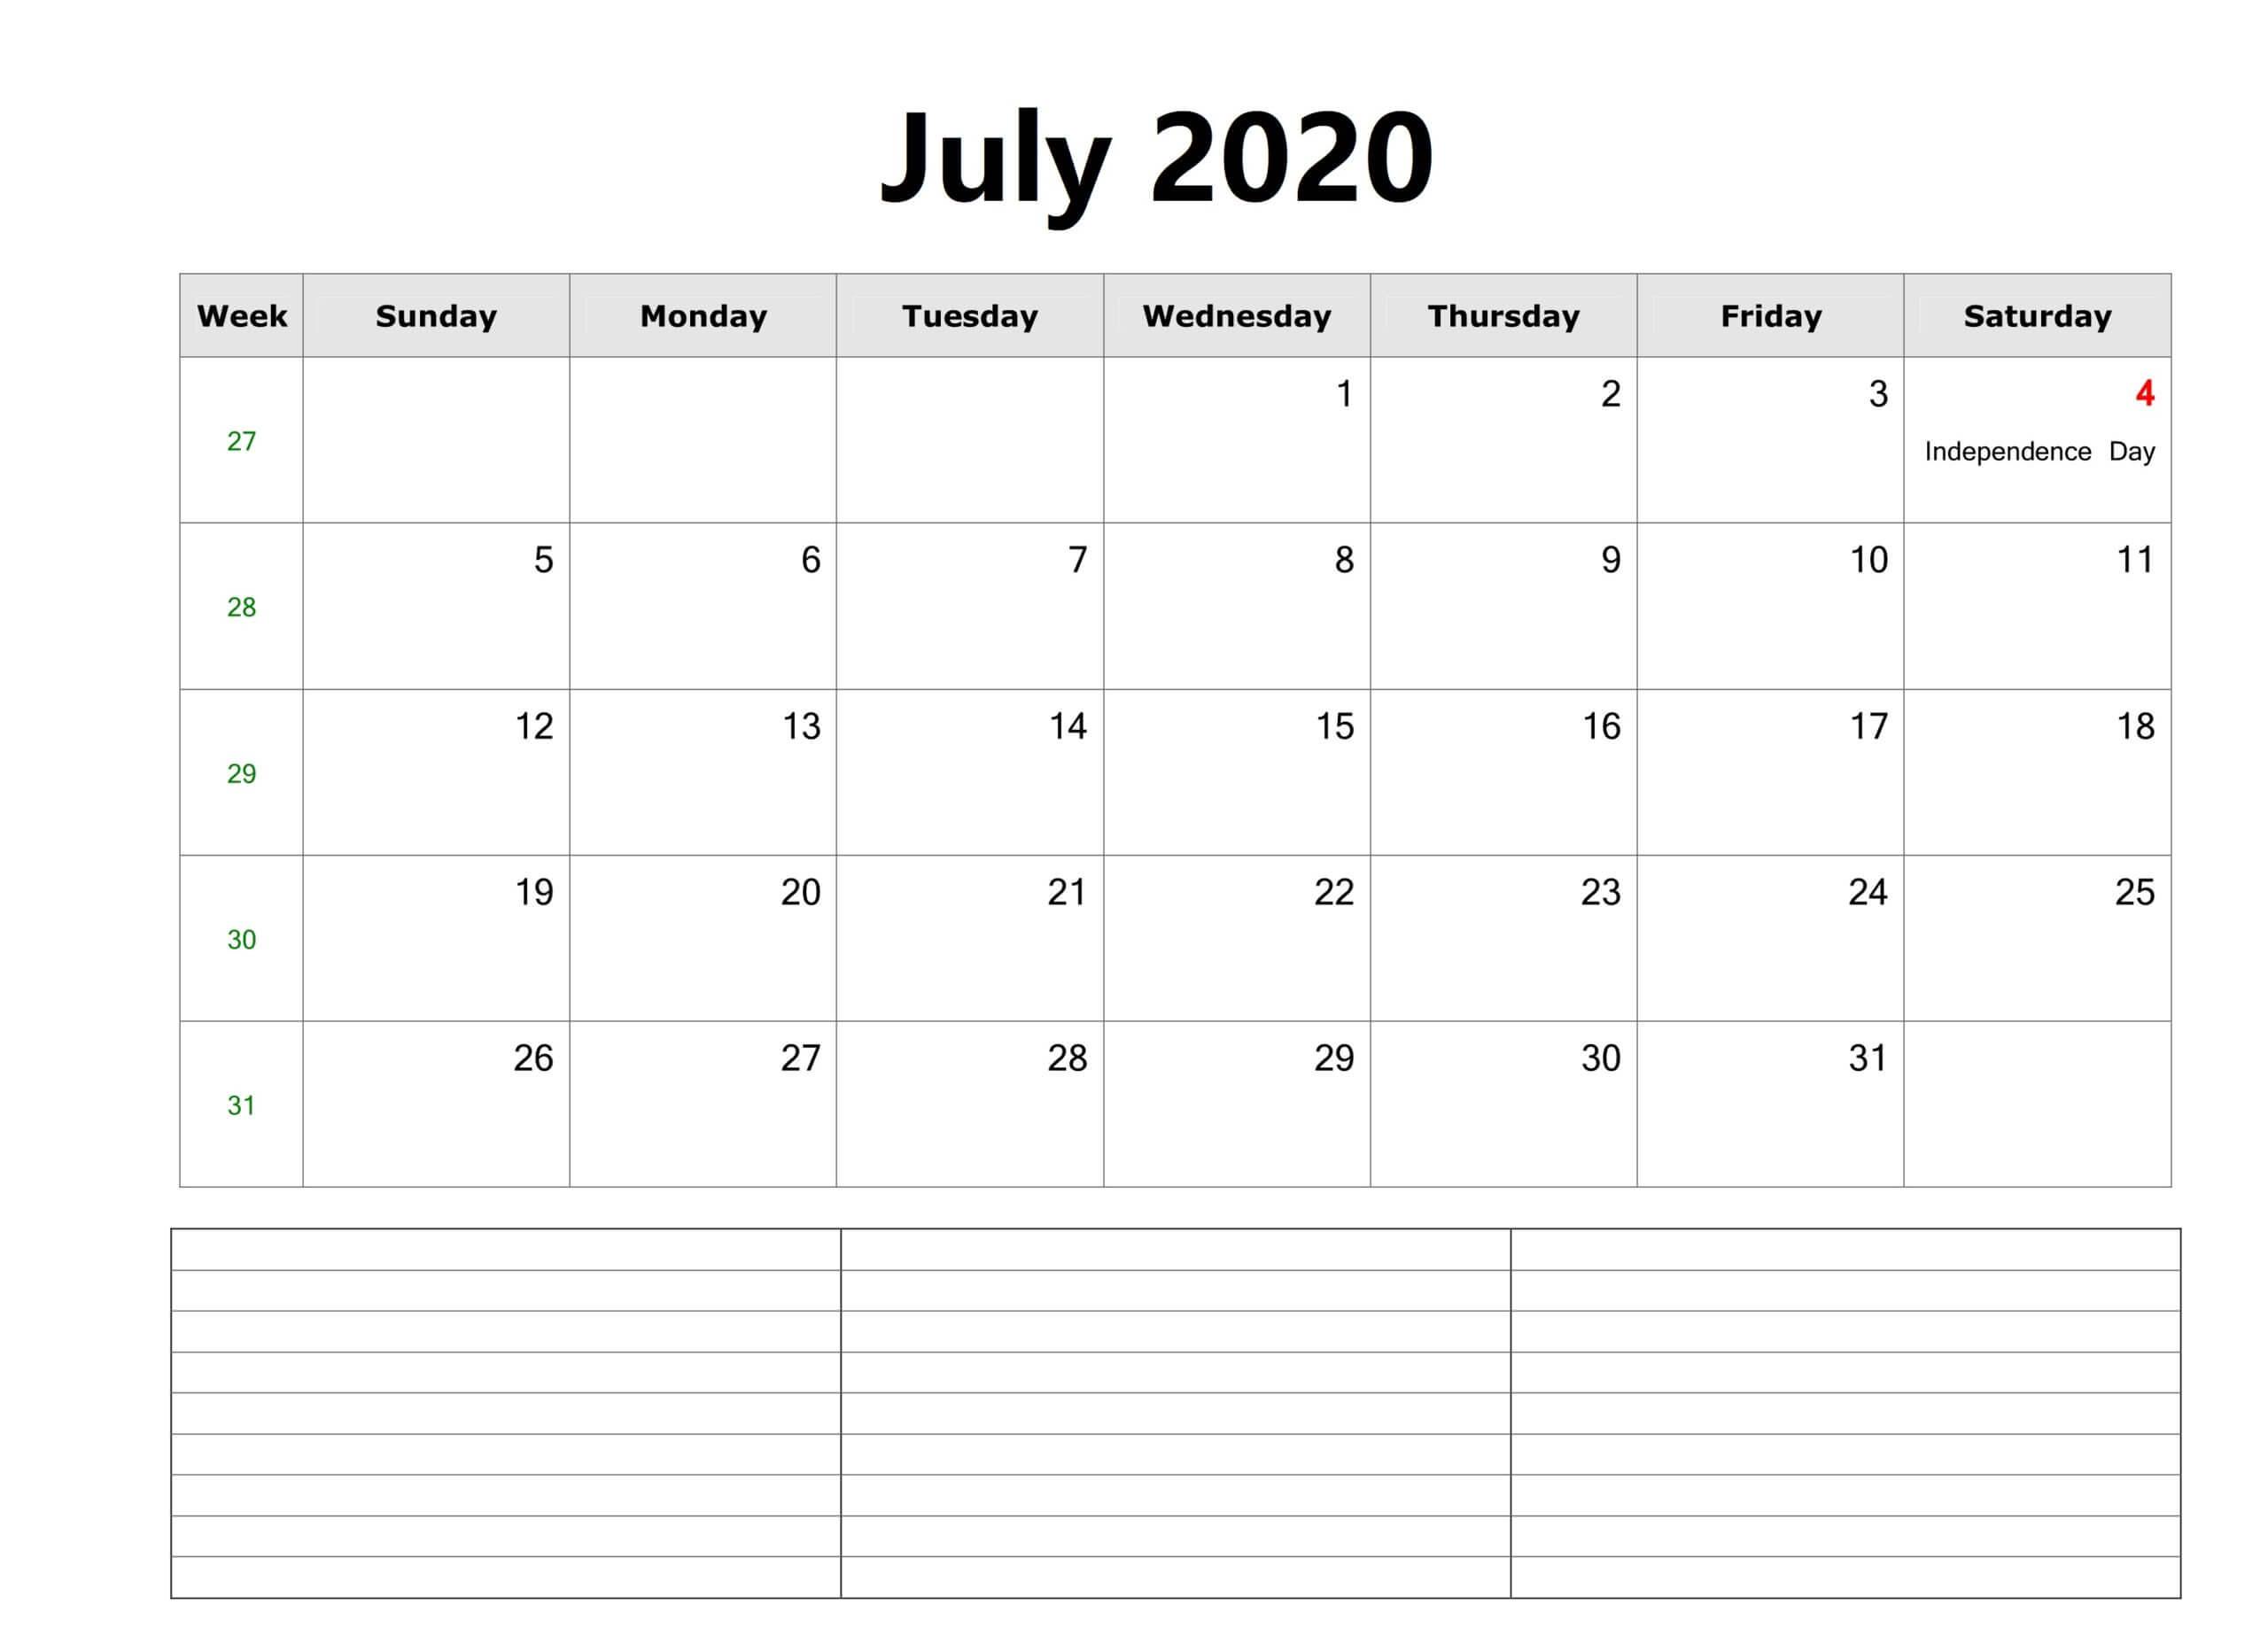 July Calendar 2020 PDF free